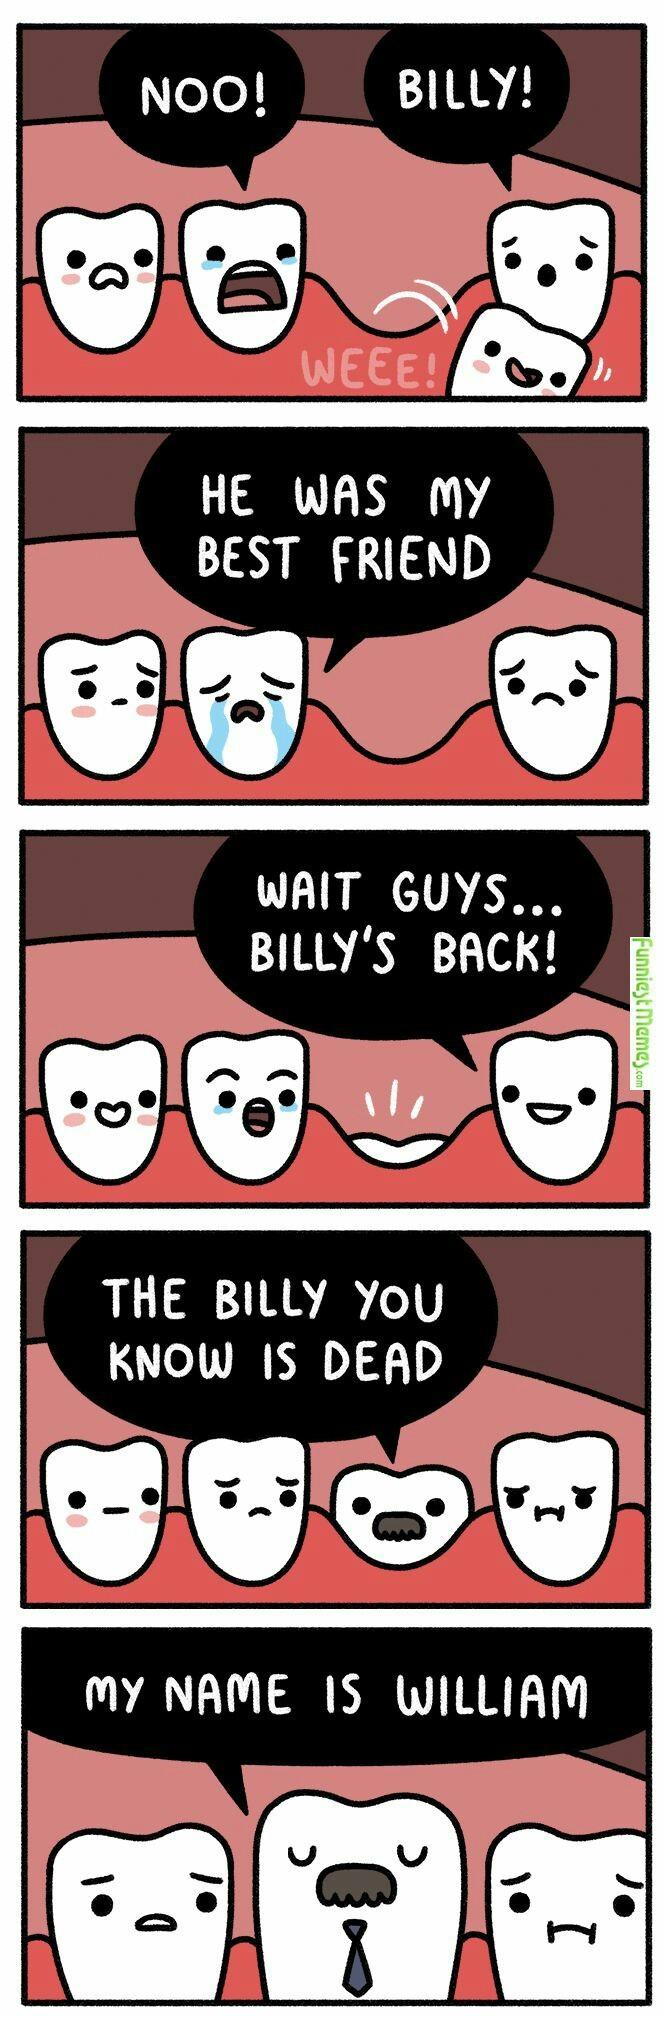 Billy noooo D: